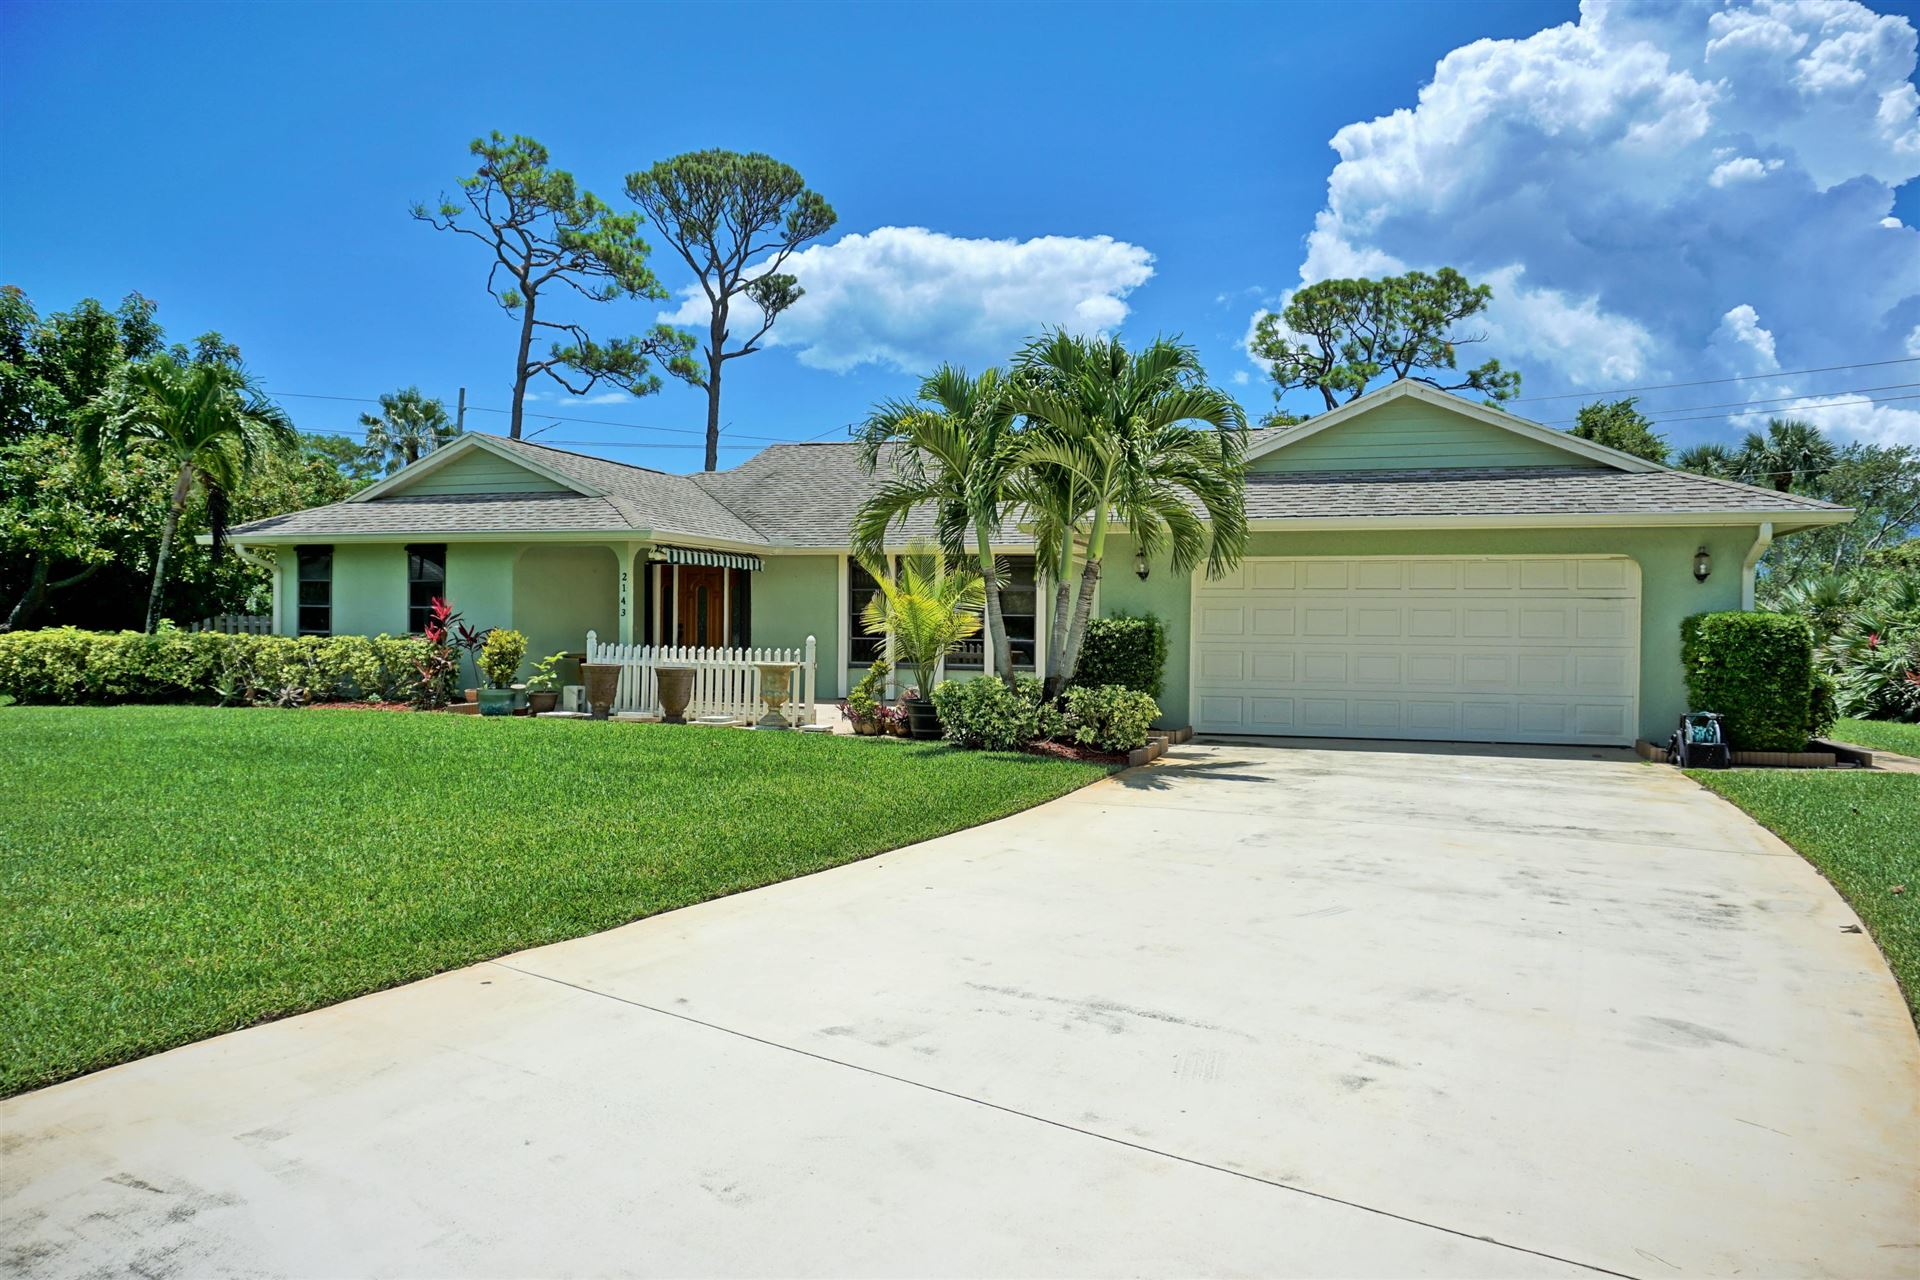 Photo of 2143 NE Marlberry Lane, Jensen Beach, FL 34957 (MLS # RX-10644242)